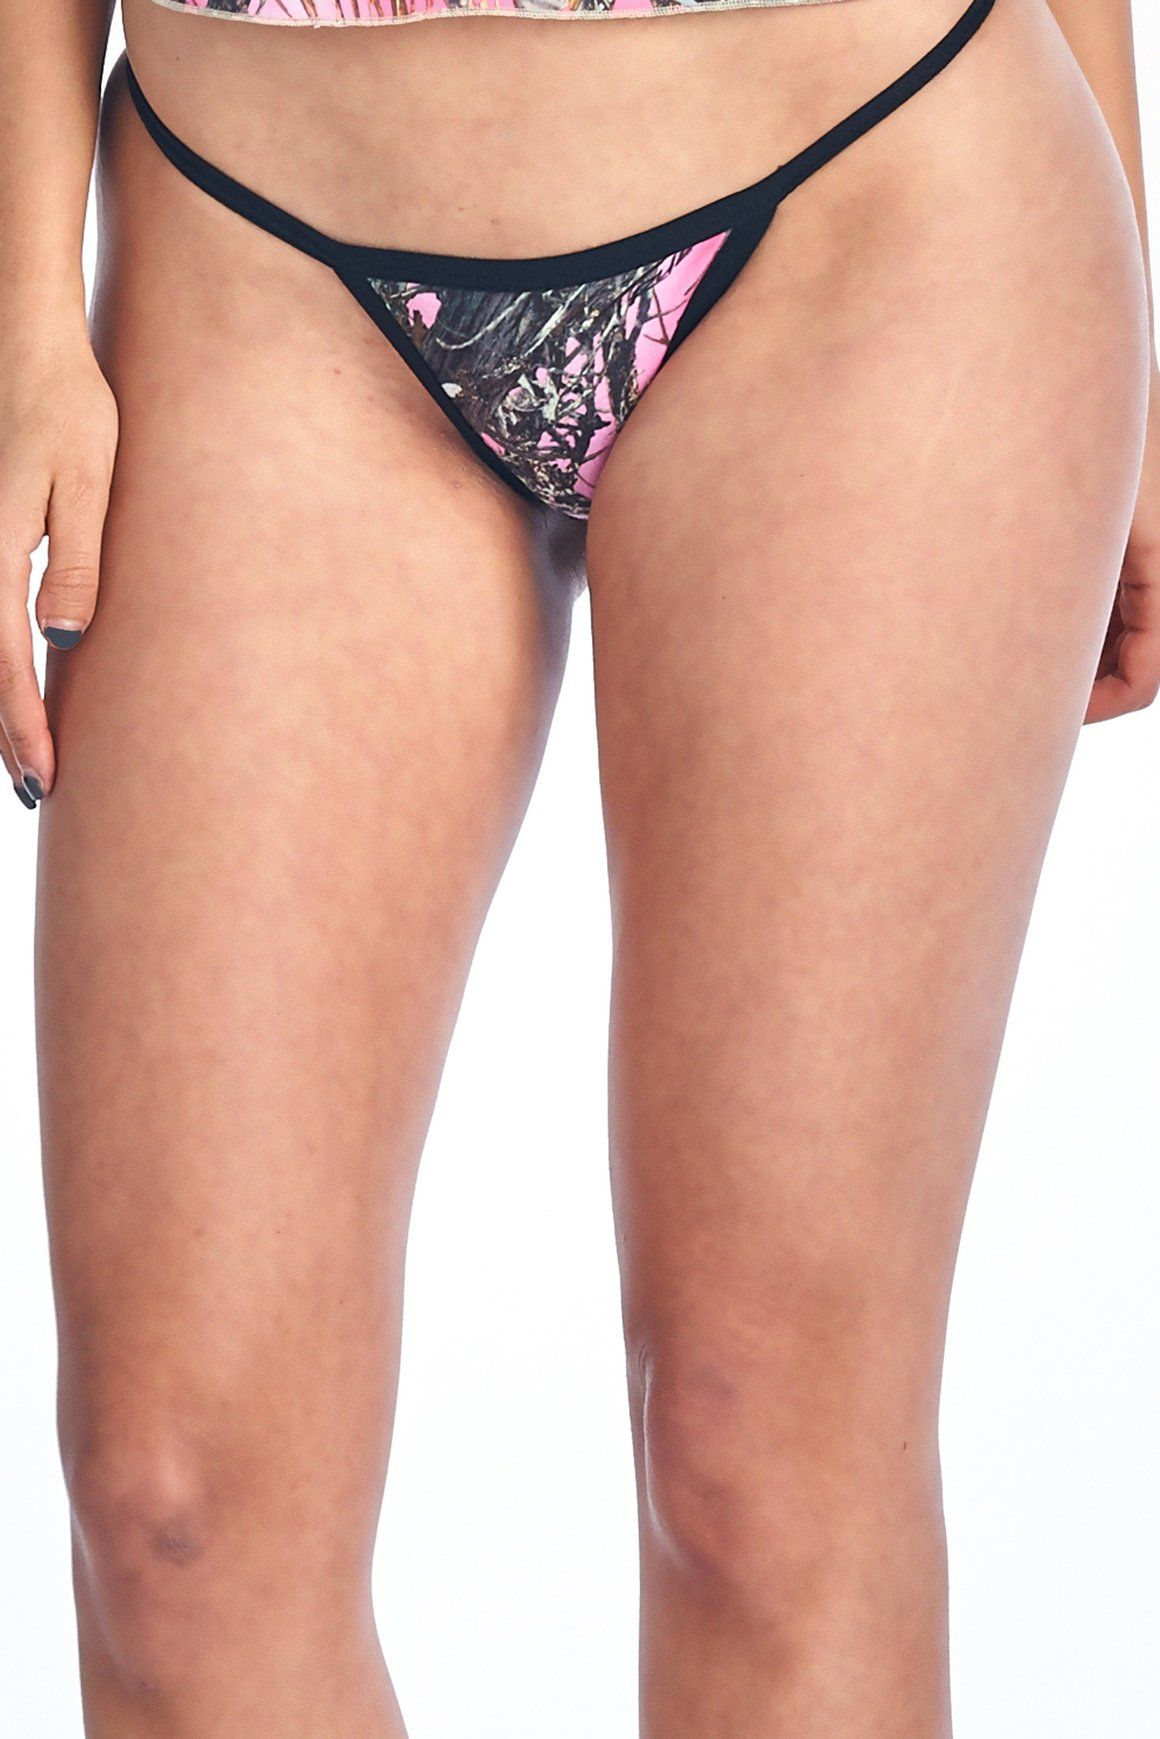 ac4700d18 Women s Booty Lace Boy Shorts Authentic True Timber Lingerie Camo ...